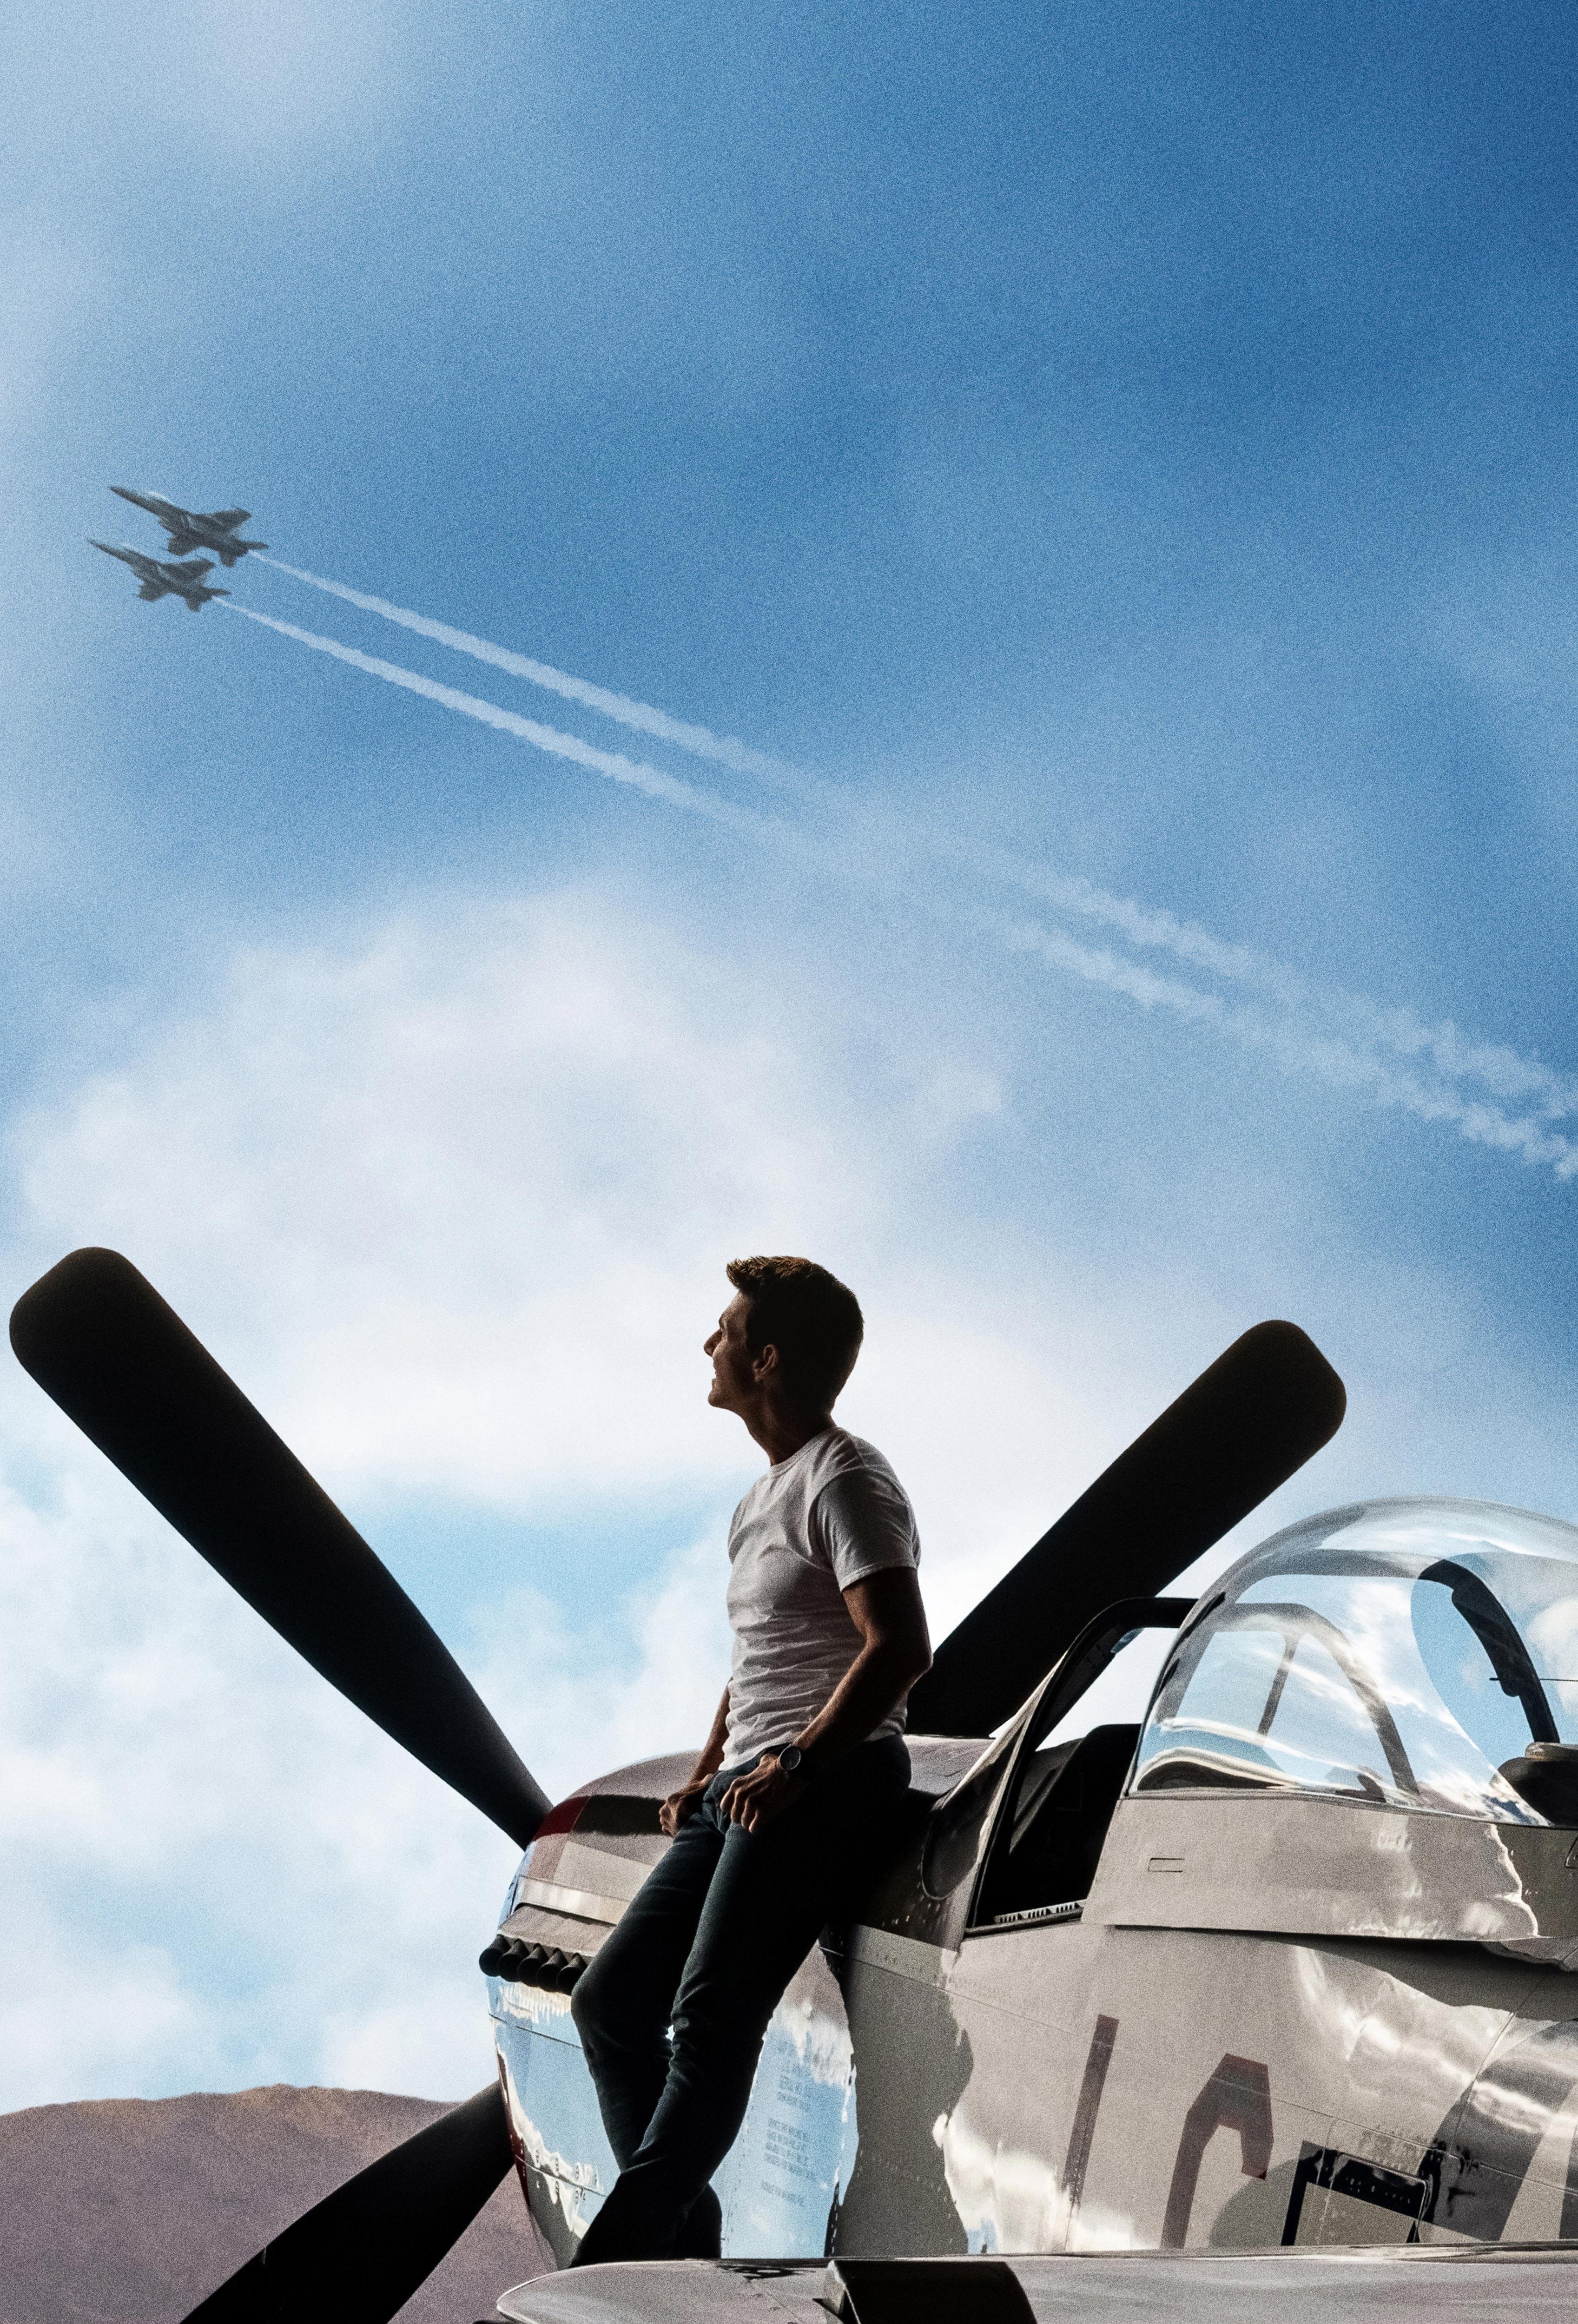 Top Gun Maverick Wallpaper Hd Movies 4k Wallpapers Images